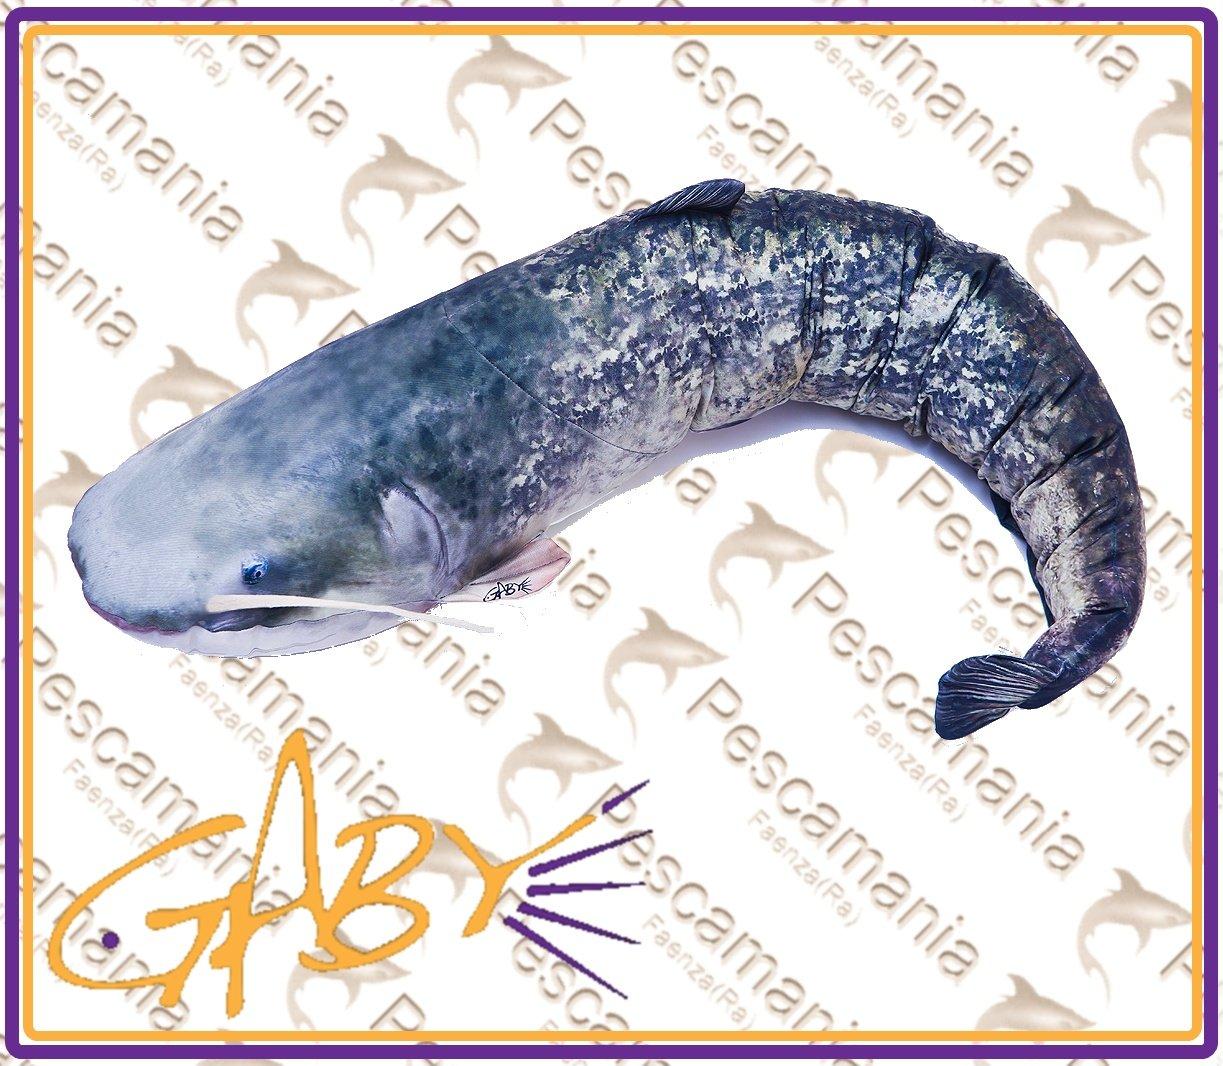 Cuscino Pesce Siluro Gaby GP-175167